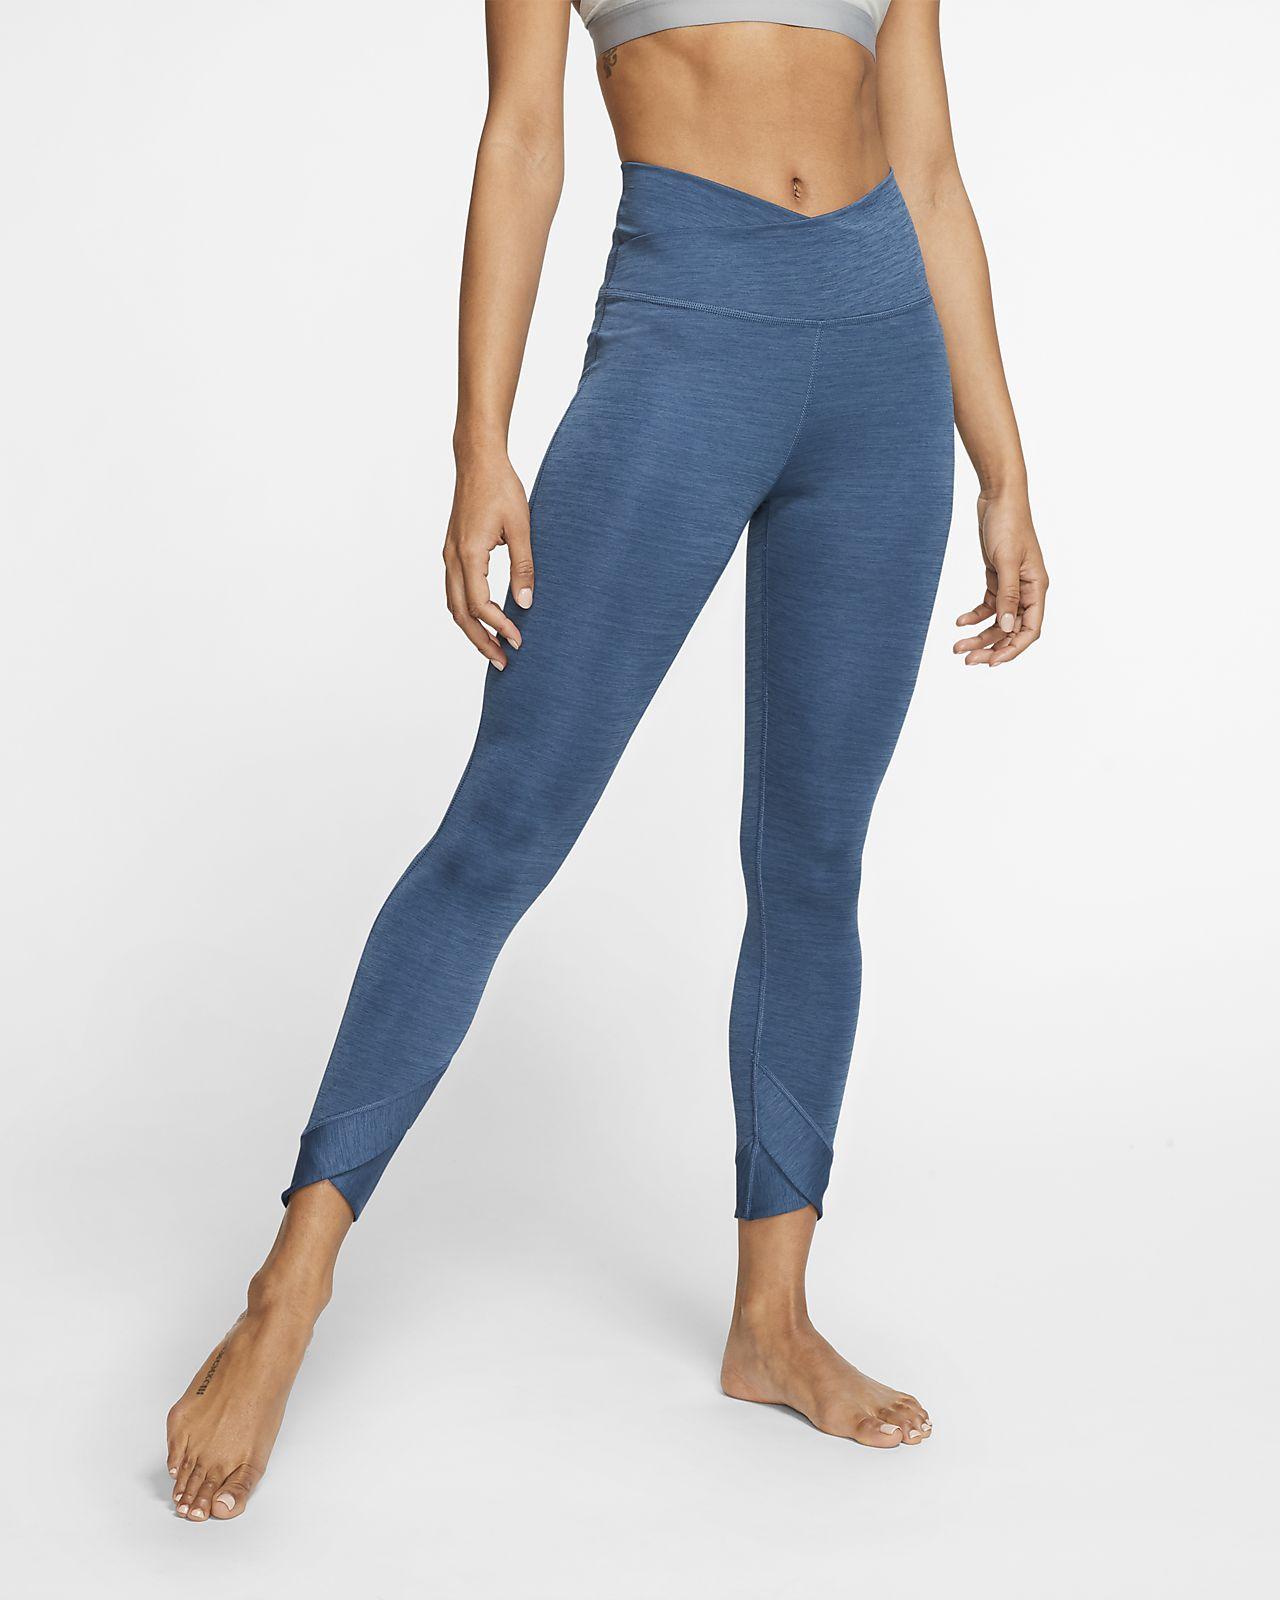 Damskie legginsy 7/8 Nike Yoga